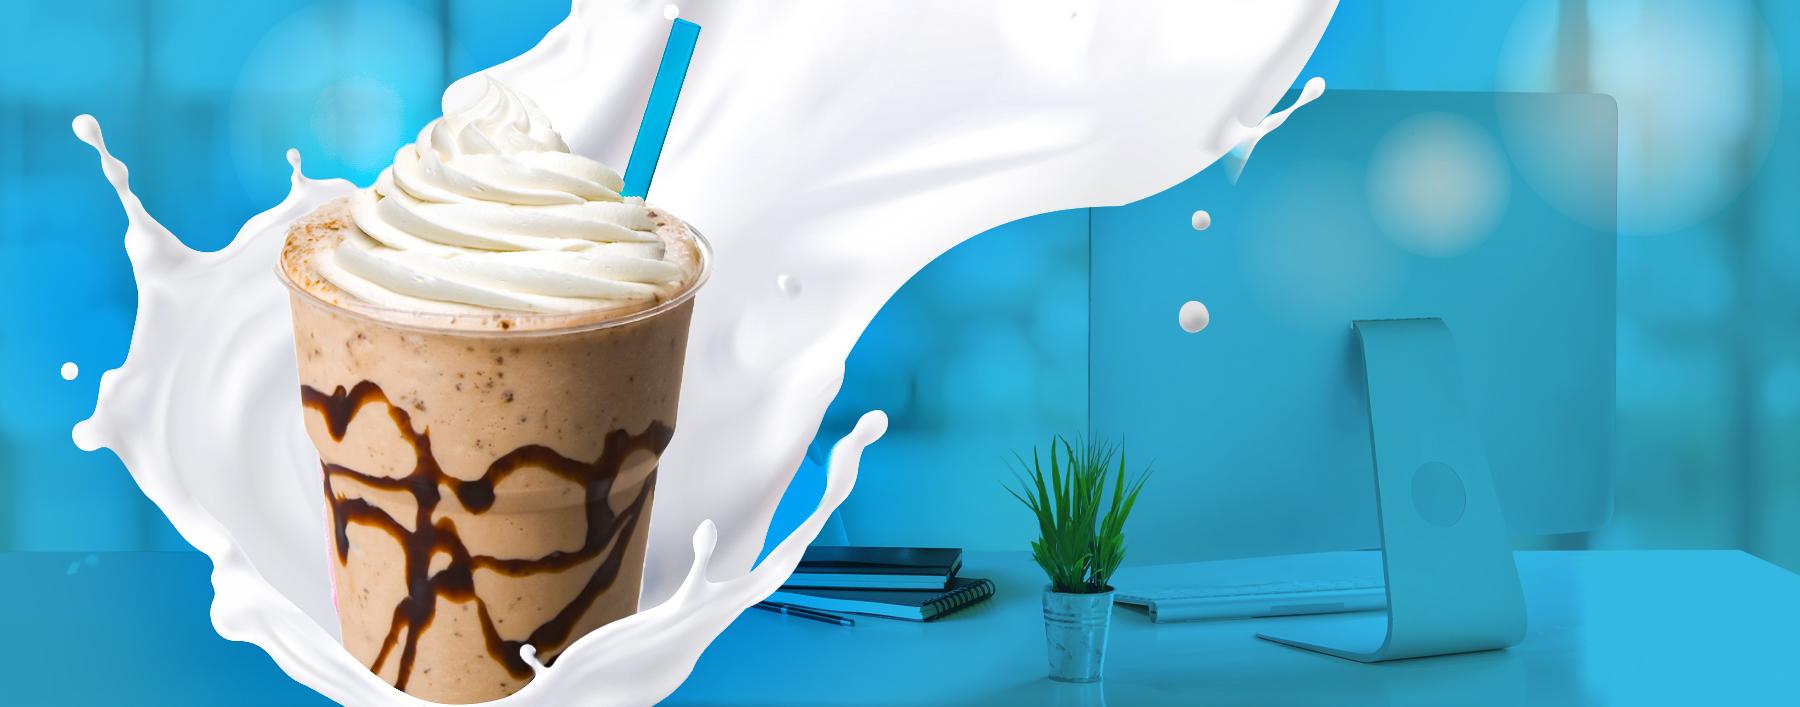 milkshake mericle blog